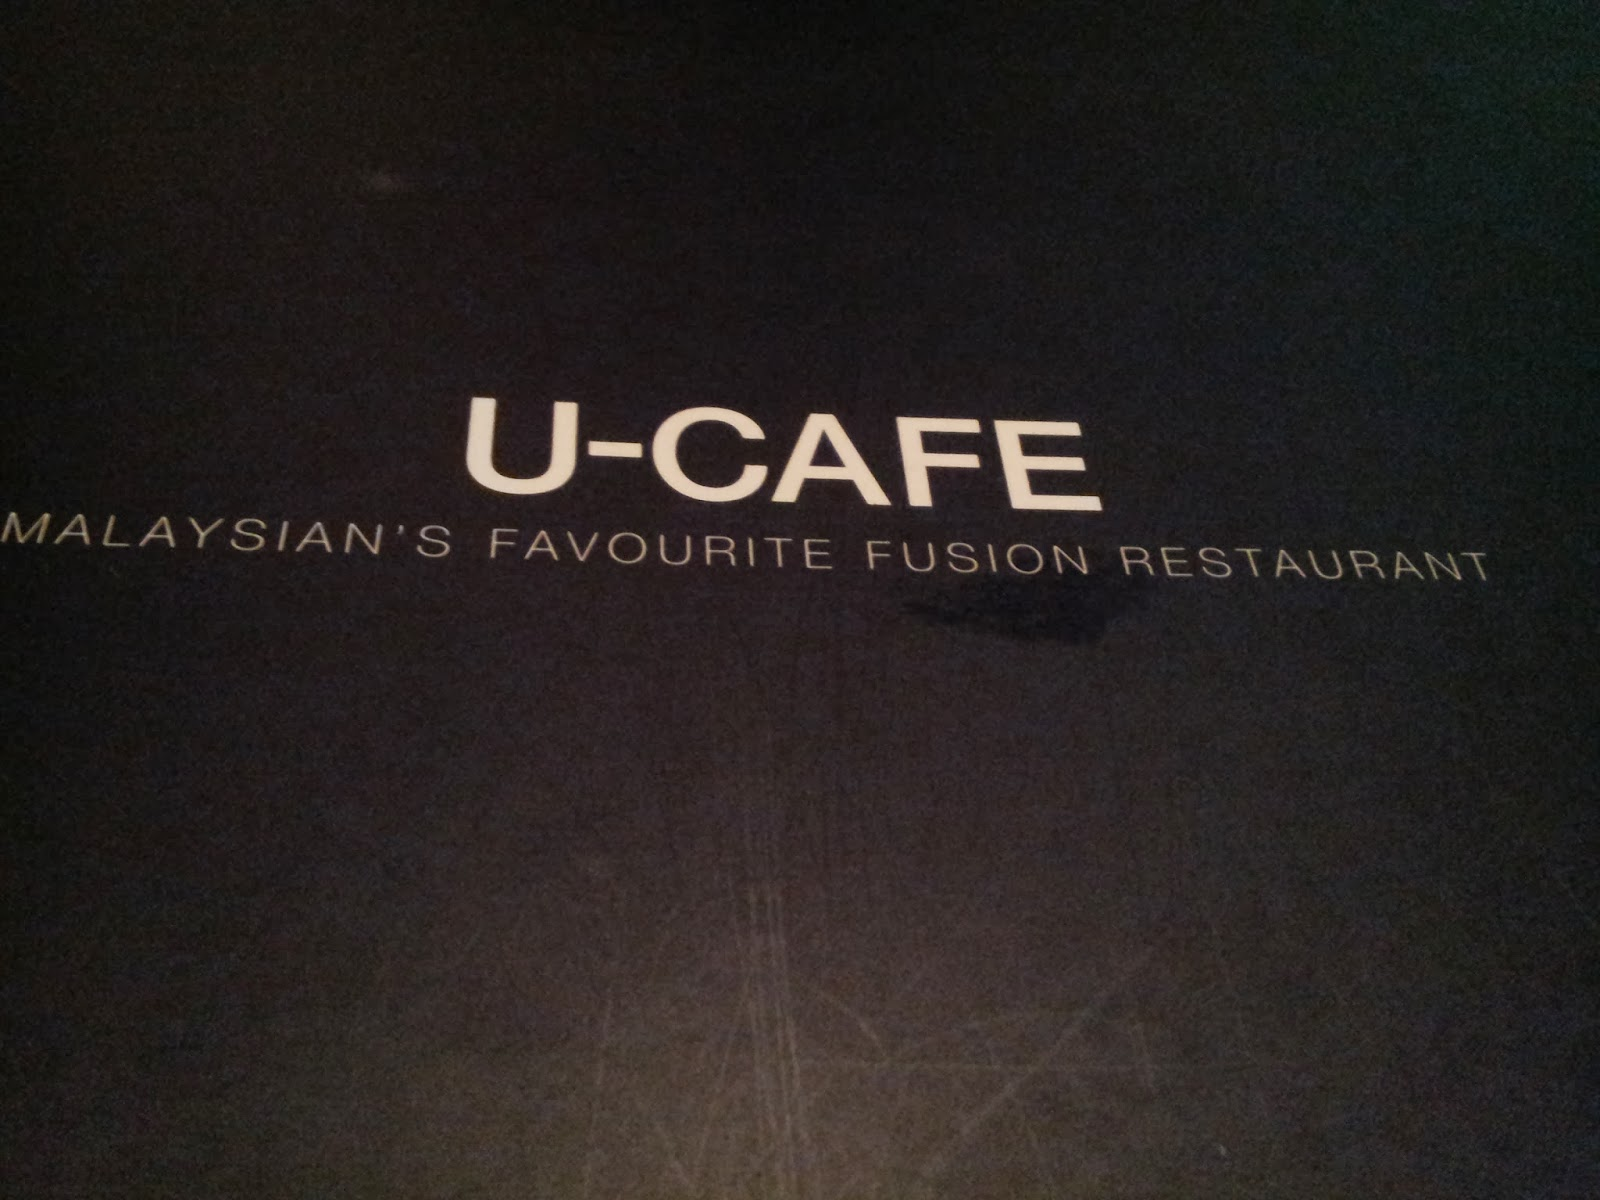 U-Cafe